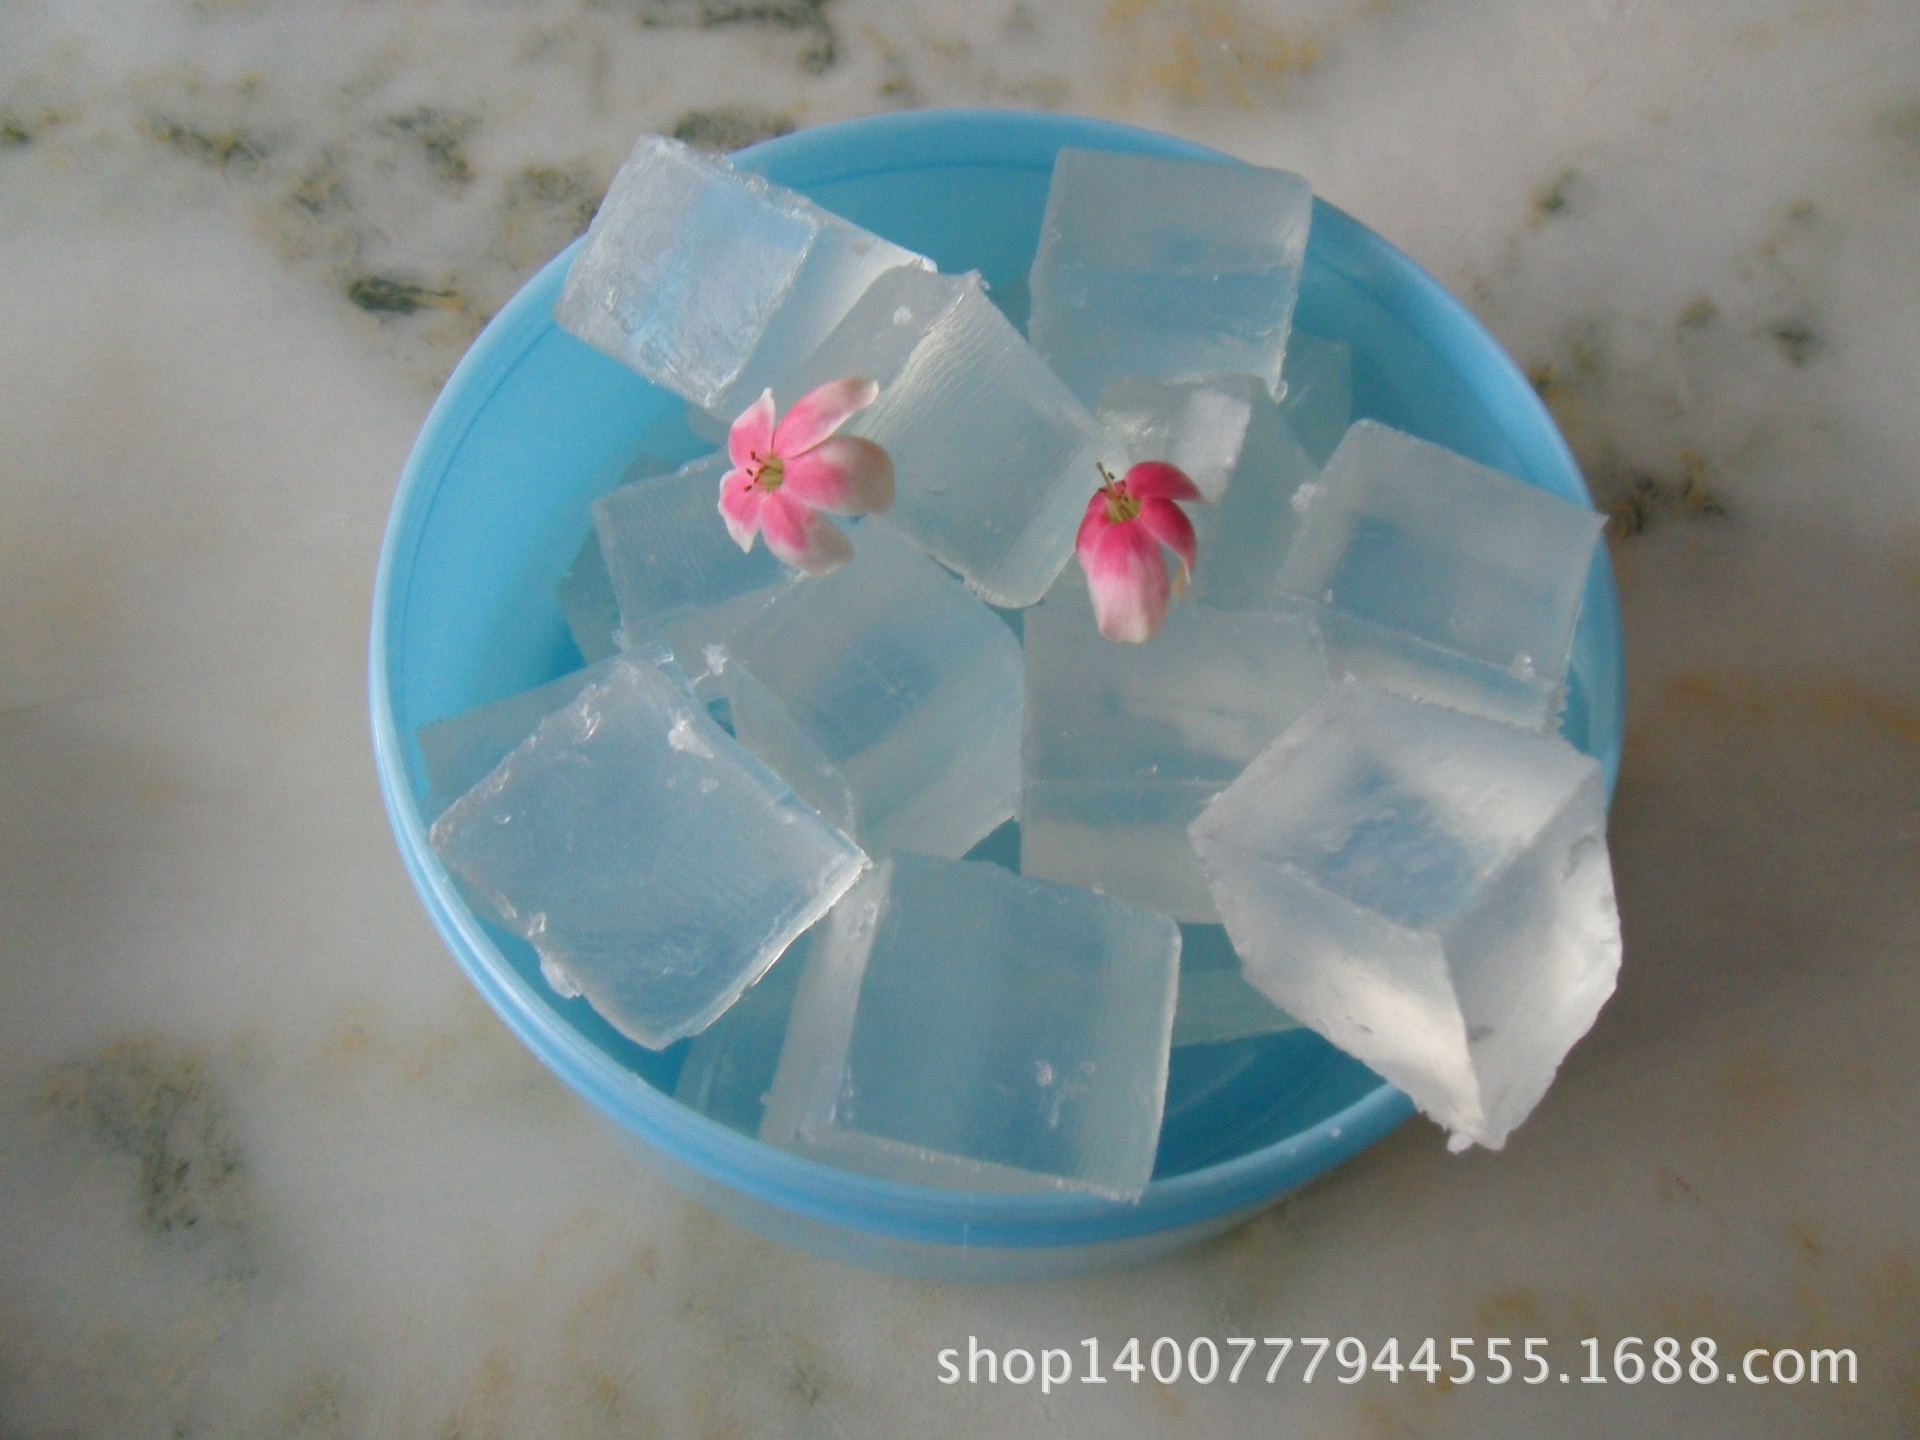 Thị trường nguyên liệu hoá chất Wholesale Handmade soap cream soap for raw materials 20kg / carton F